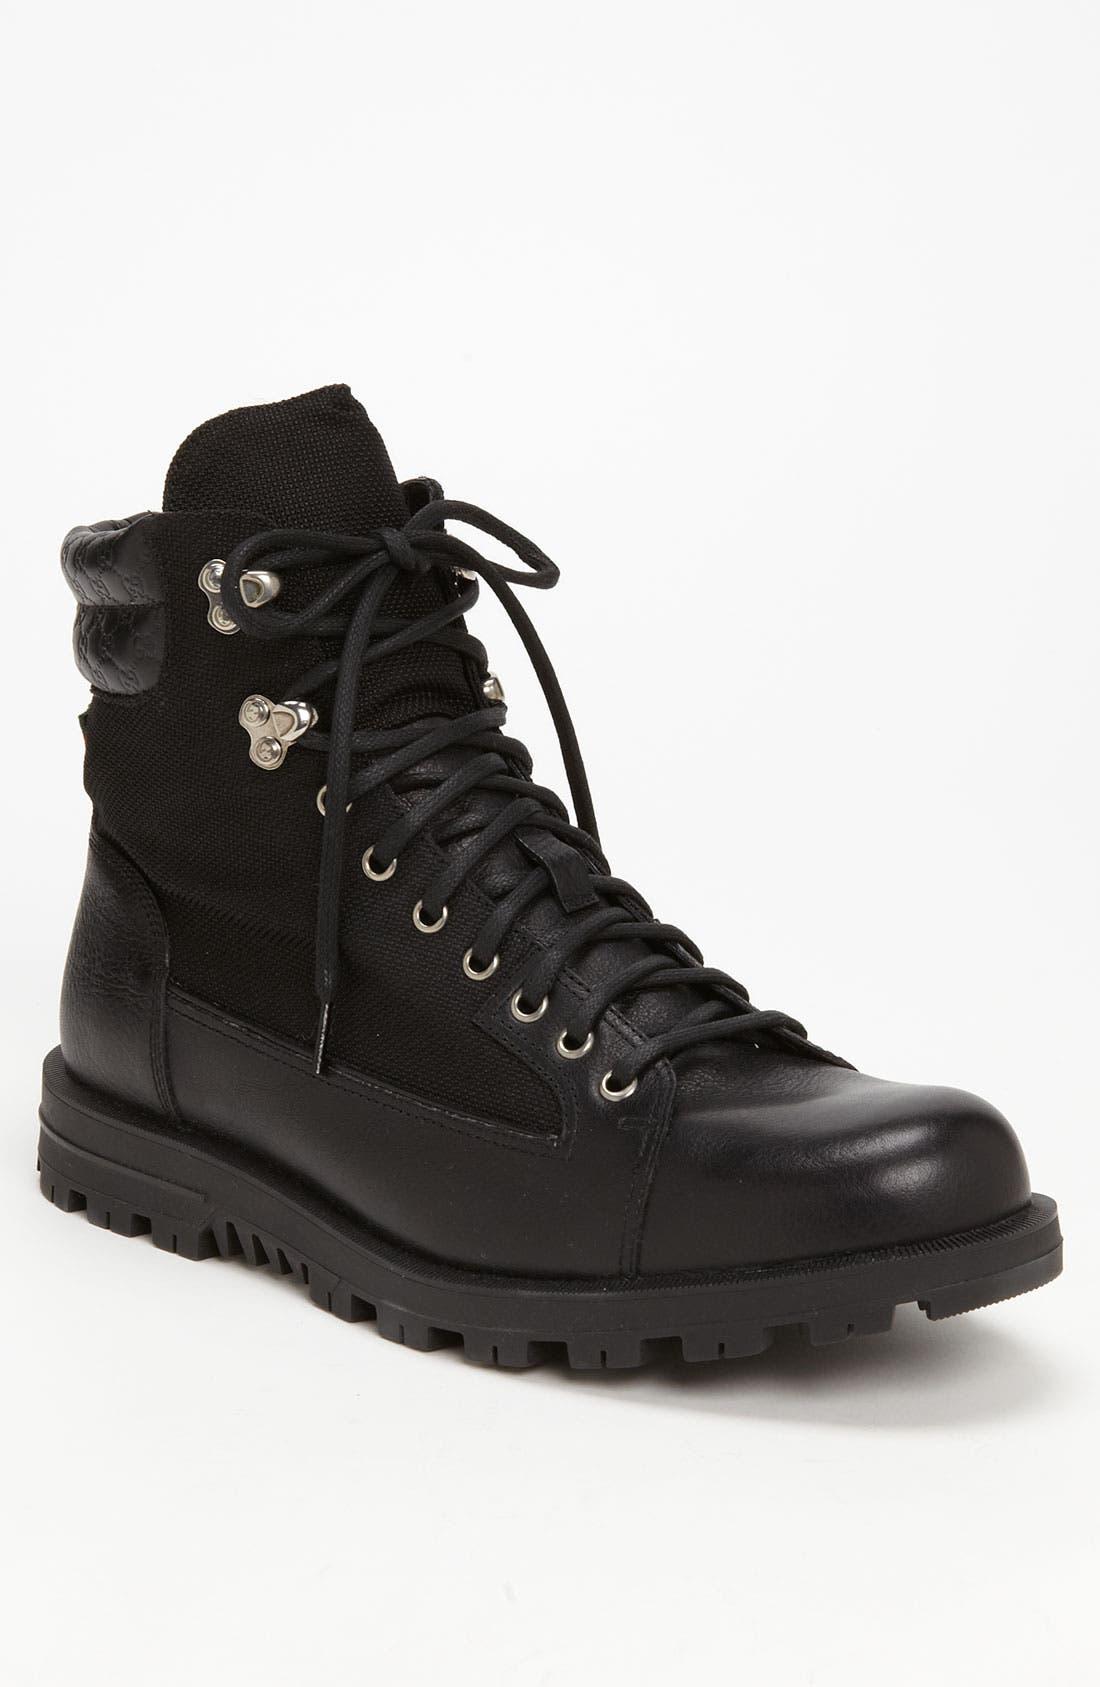 Alternate Image 1 Selected - Gucci 'Meguro' Combat Boot